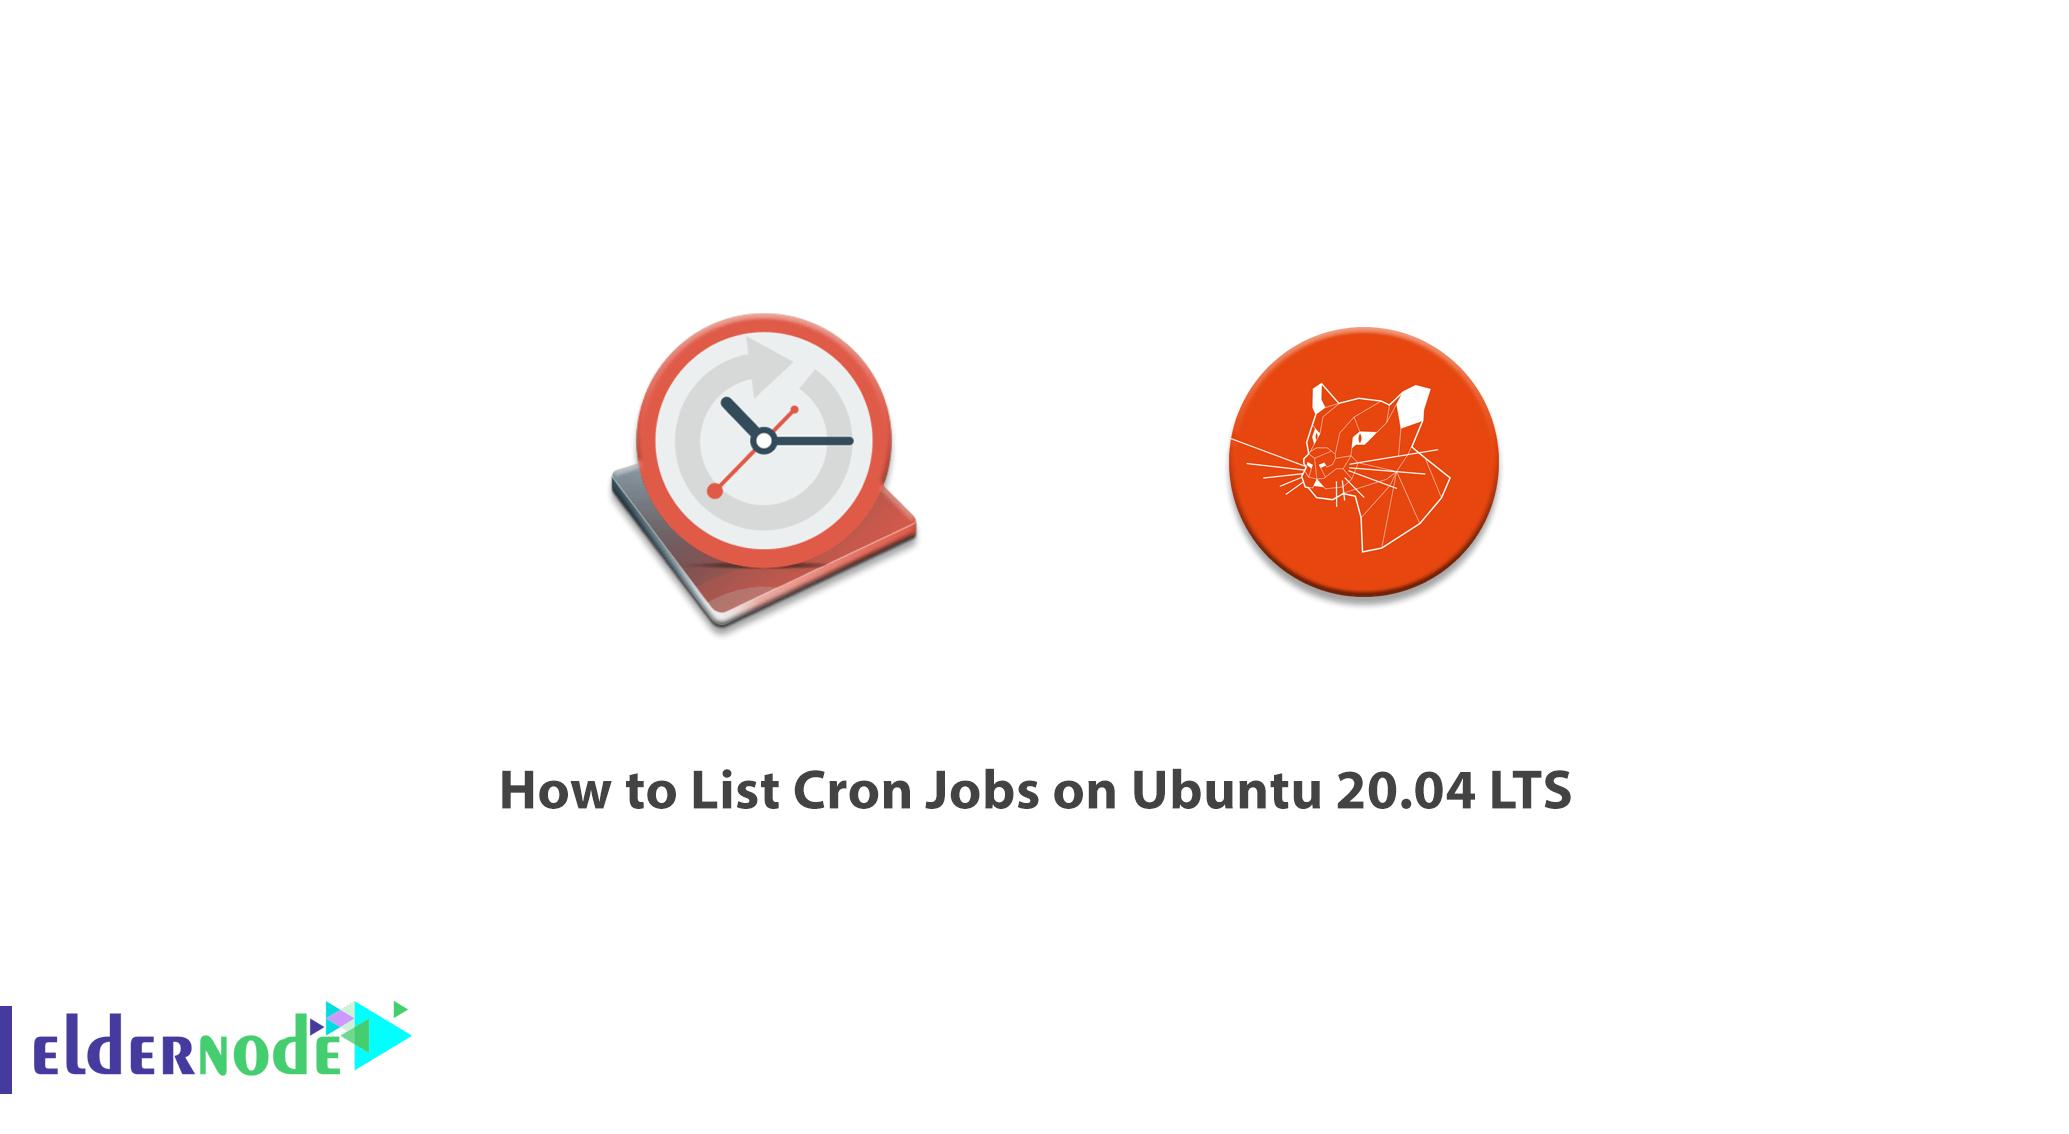 How to List Cron Jobs on Ubuntu 20.04 LTS